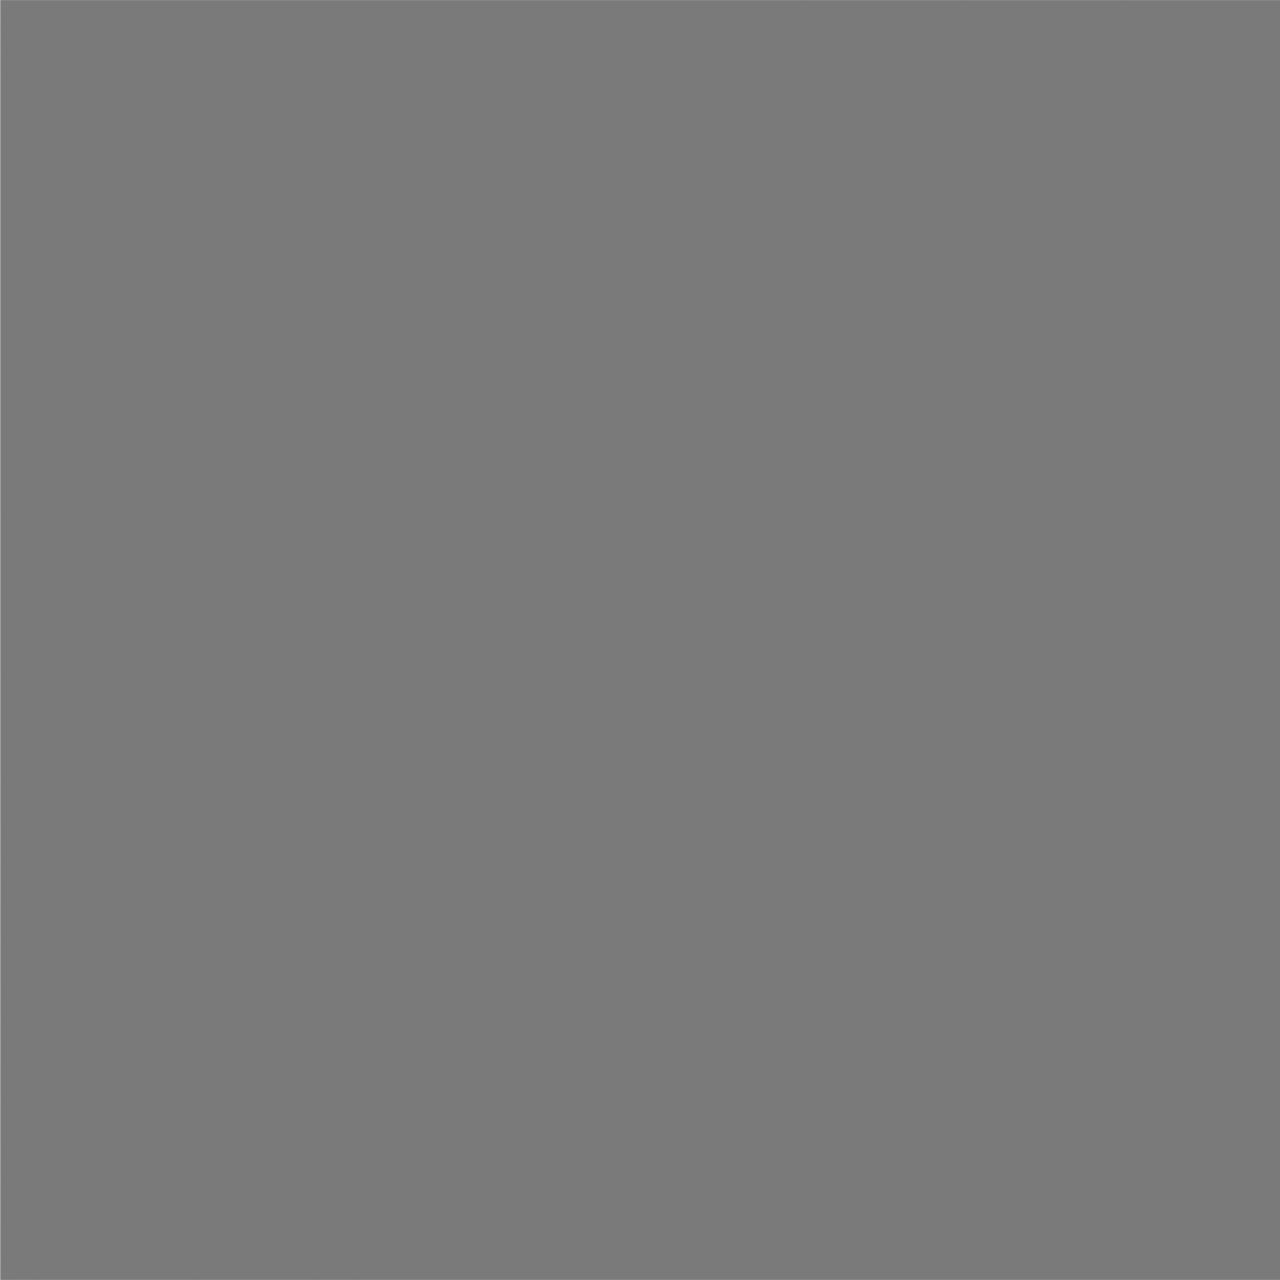 https://lamalifimmobilier.ma/wp-content/uploads/2020/07/Stratifié-Grey-1280x1280.png